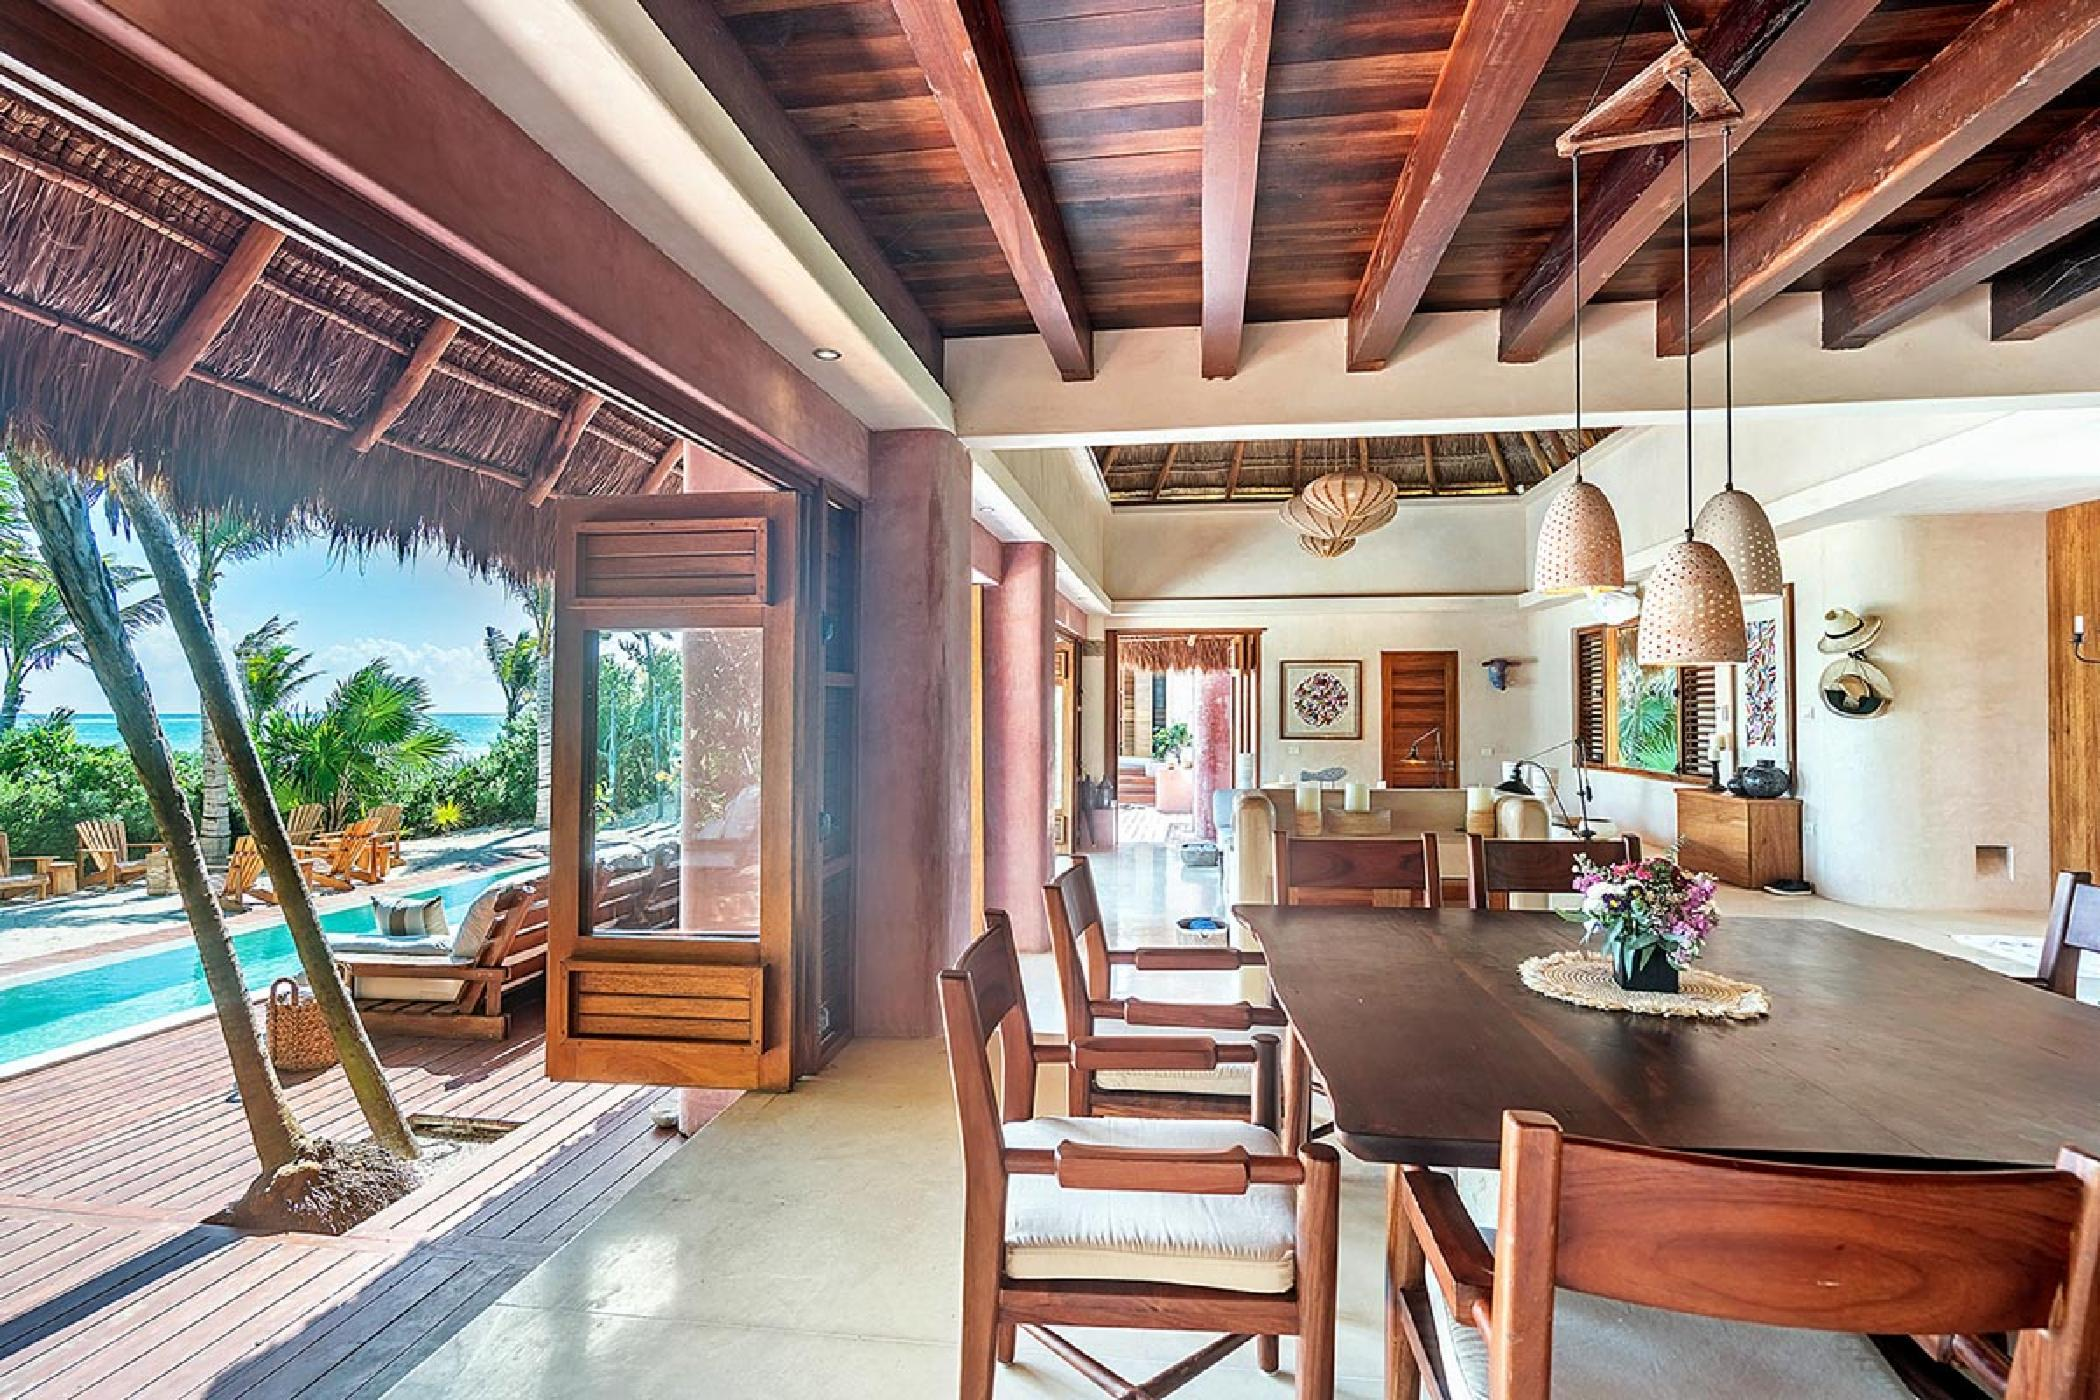 Maya_Luxe_Riviera_Maya_Luxury_Villas_Experiences_Sian_Kaan_Tulum_4_Bedrooms_Casa_Cantarena_12.jpg